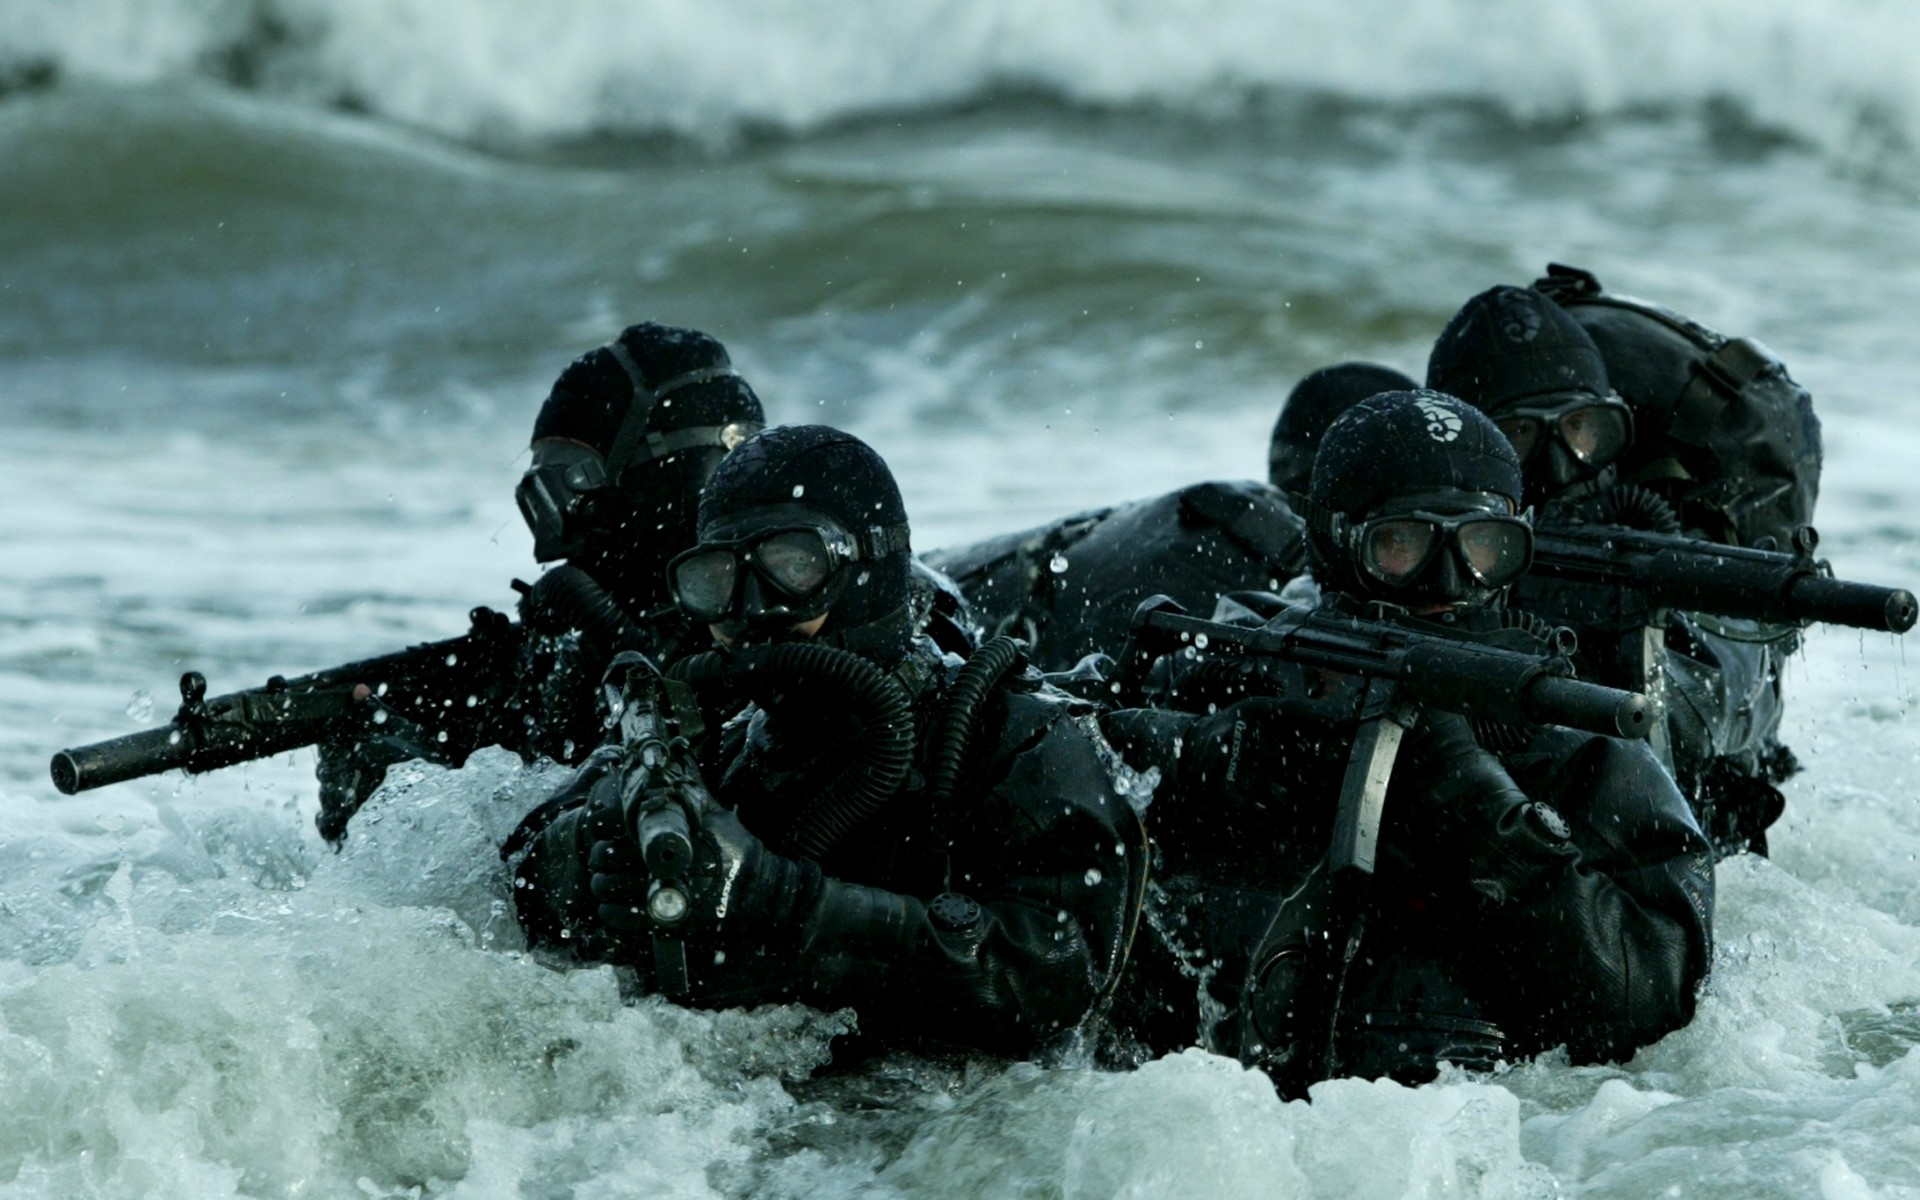 Best 25+ Navy seal wallpaper ideas on Pinterest | Seal team 6, Us navy  seals training and Navy seal training